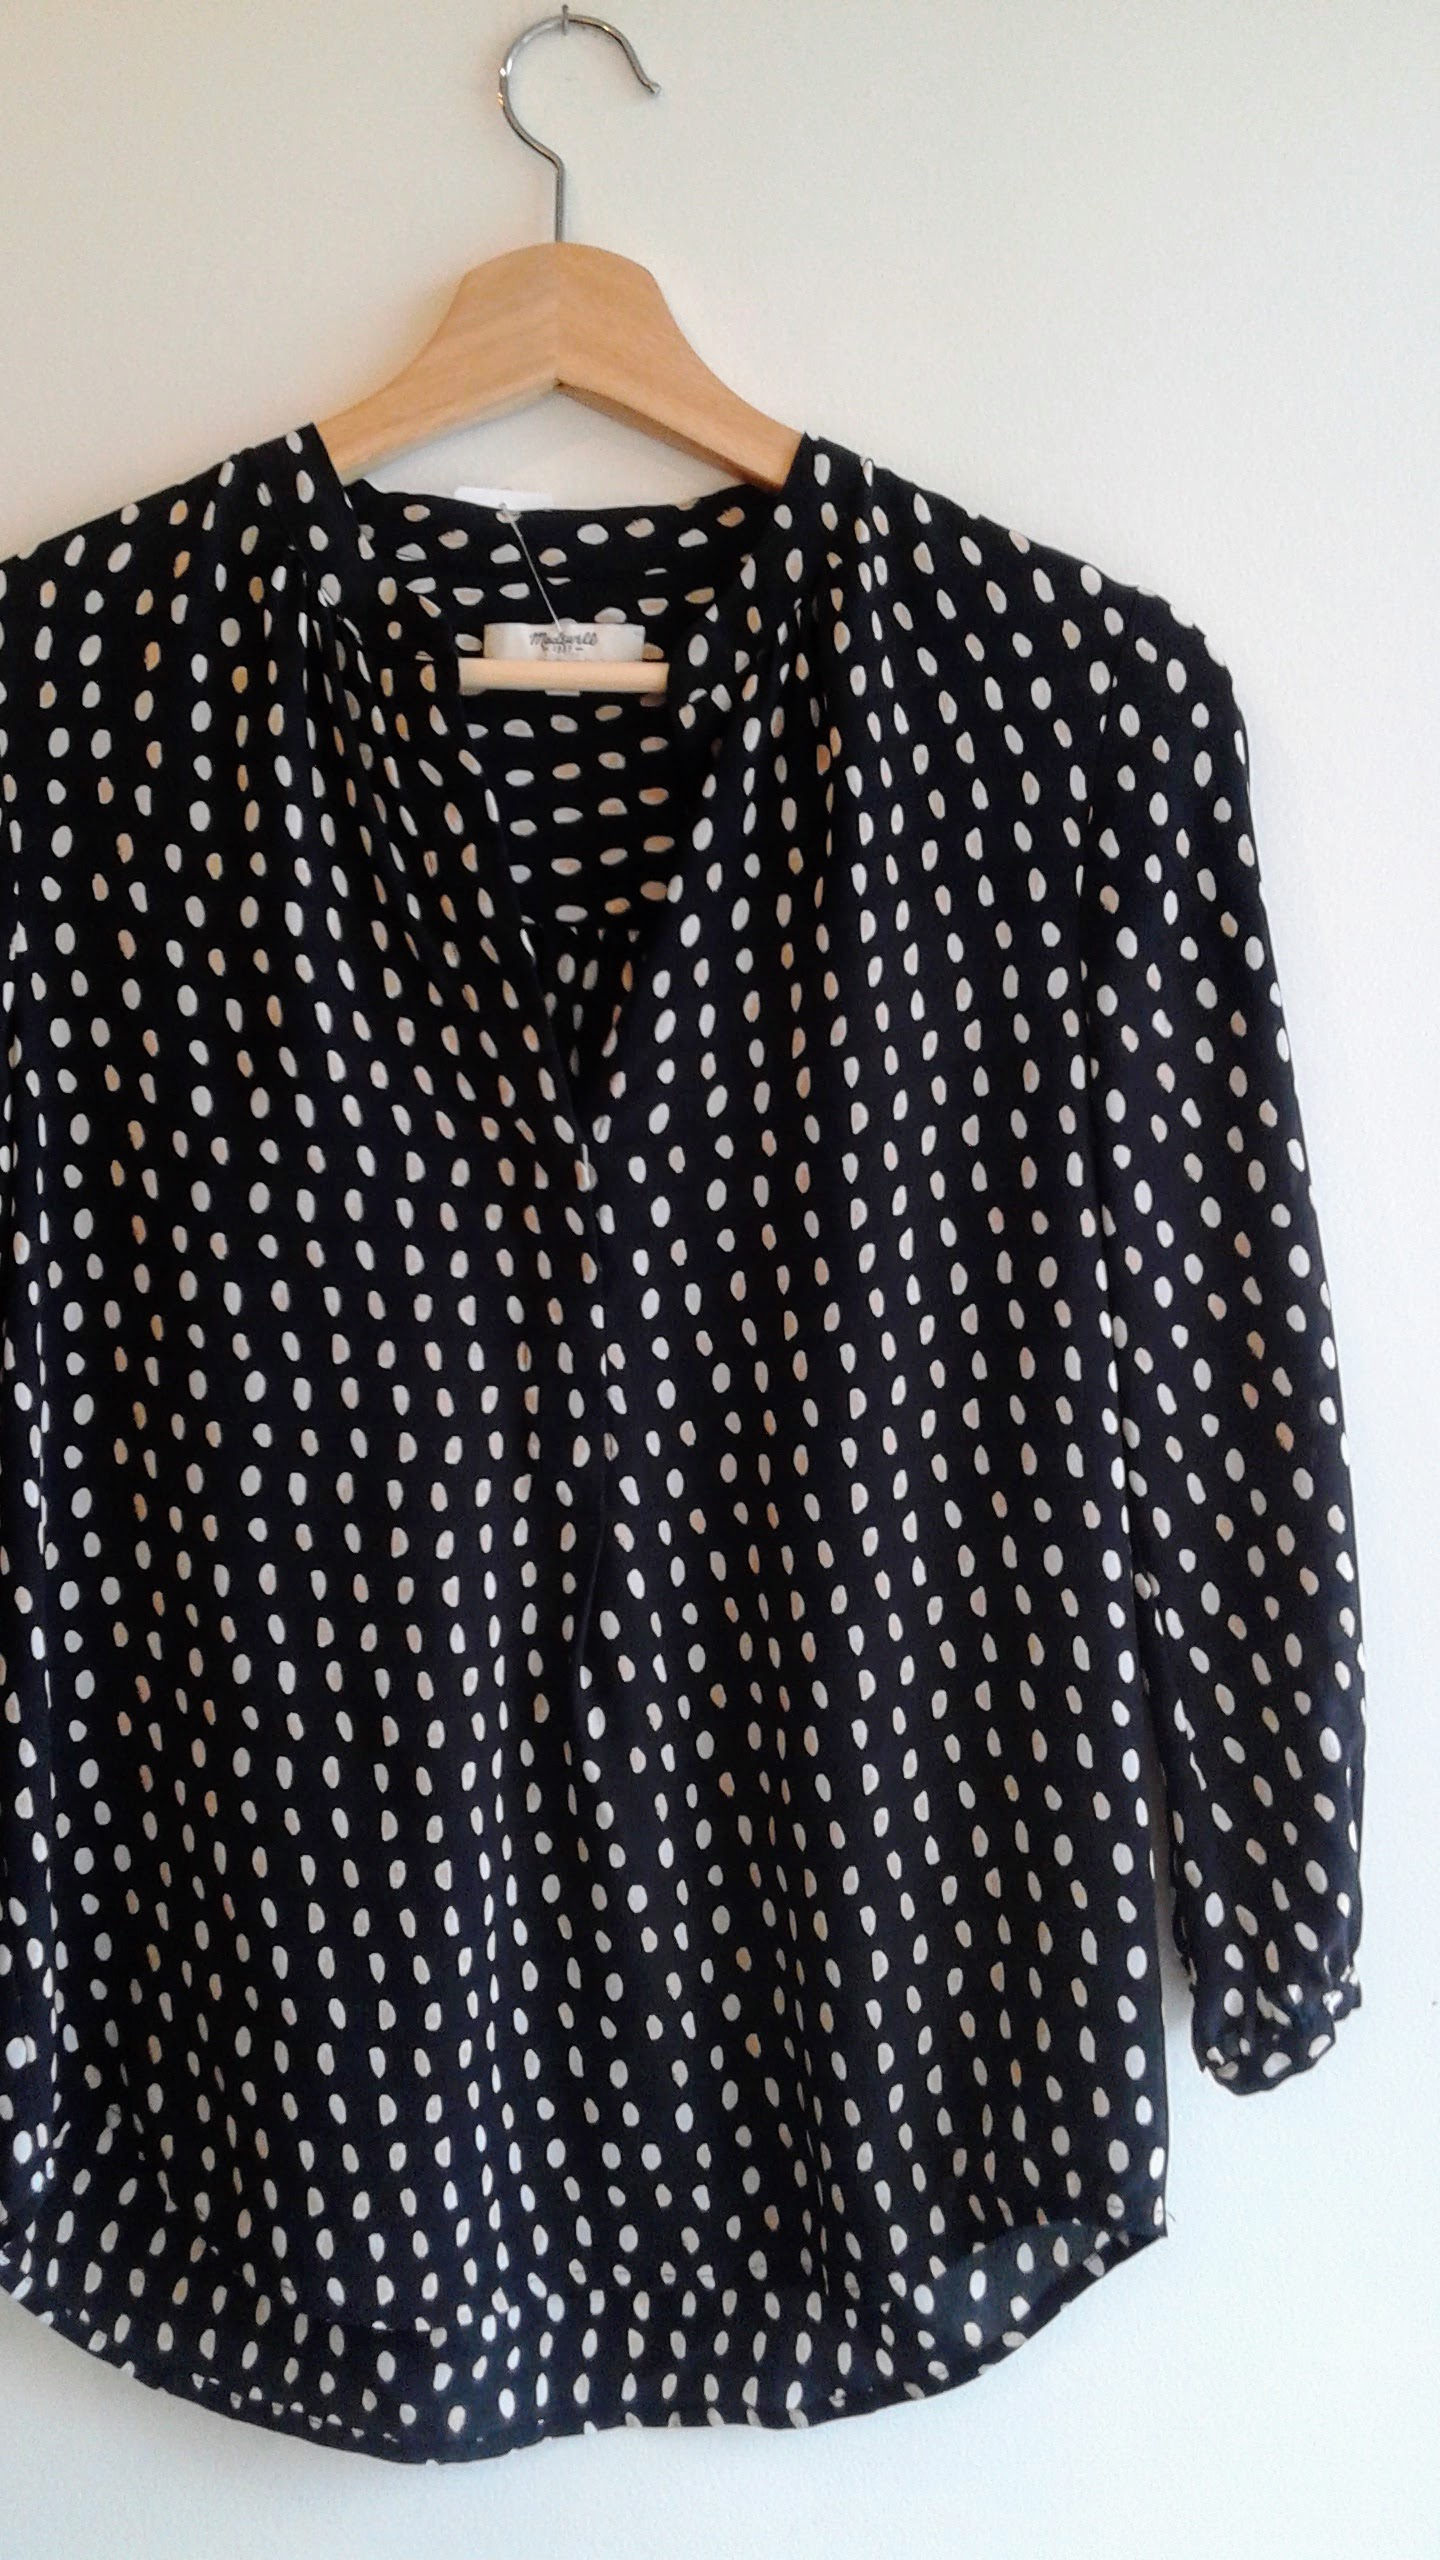 Madewell shirt; Size S, $28